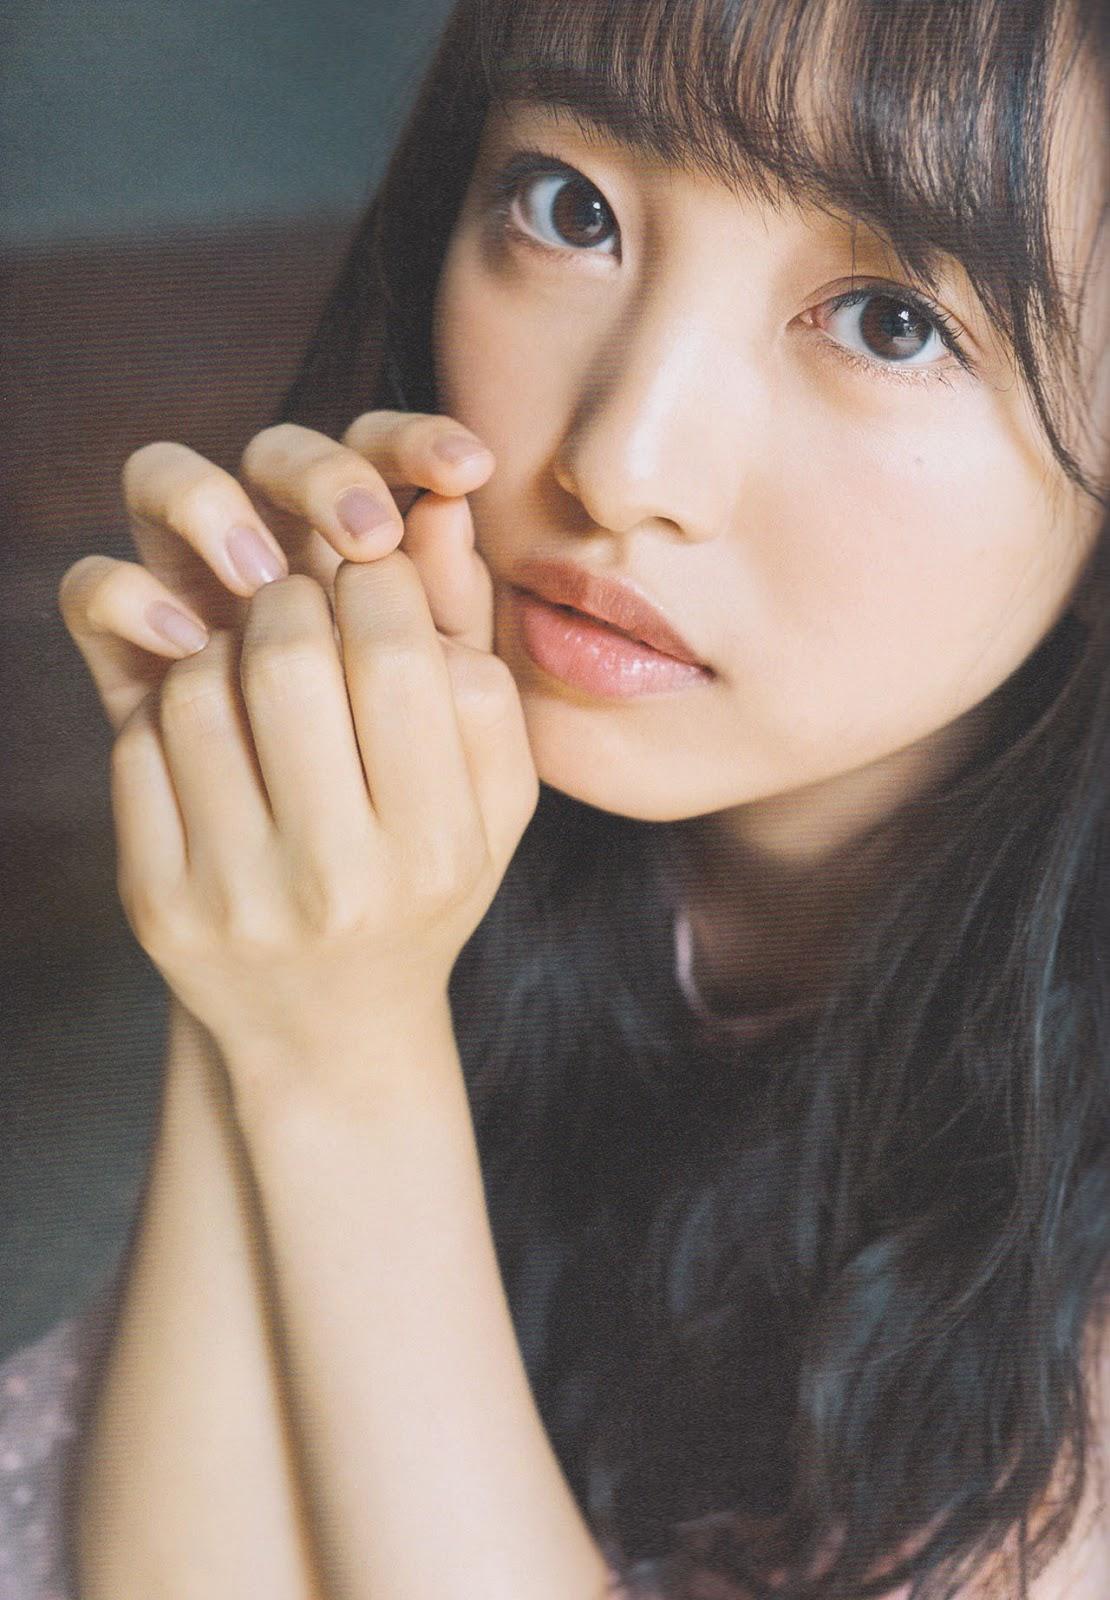 Mukaichi Mion 向井地美音, B.L.T Graph. 2017.11.15 Vol.25 (TOKYO NEWS MOOK)